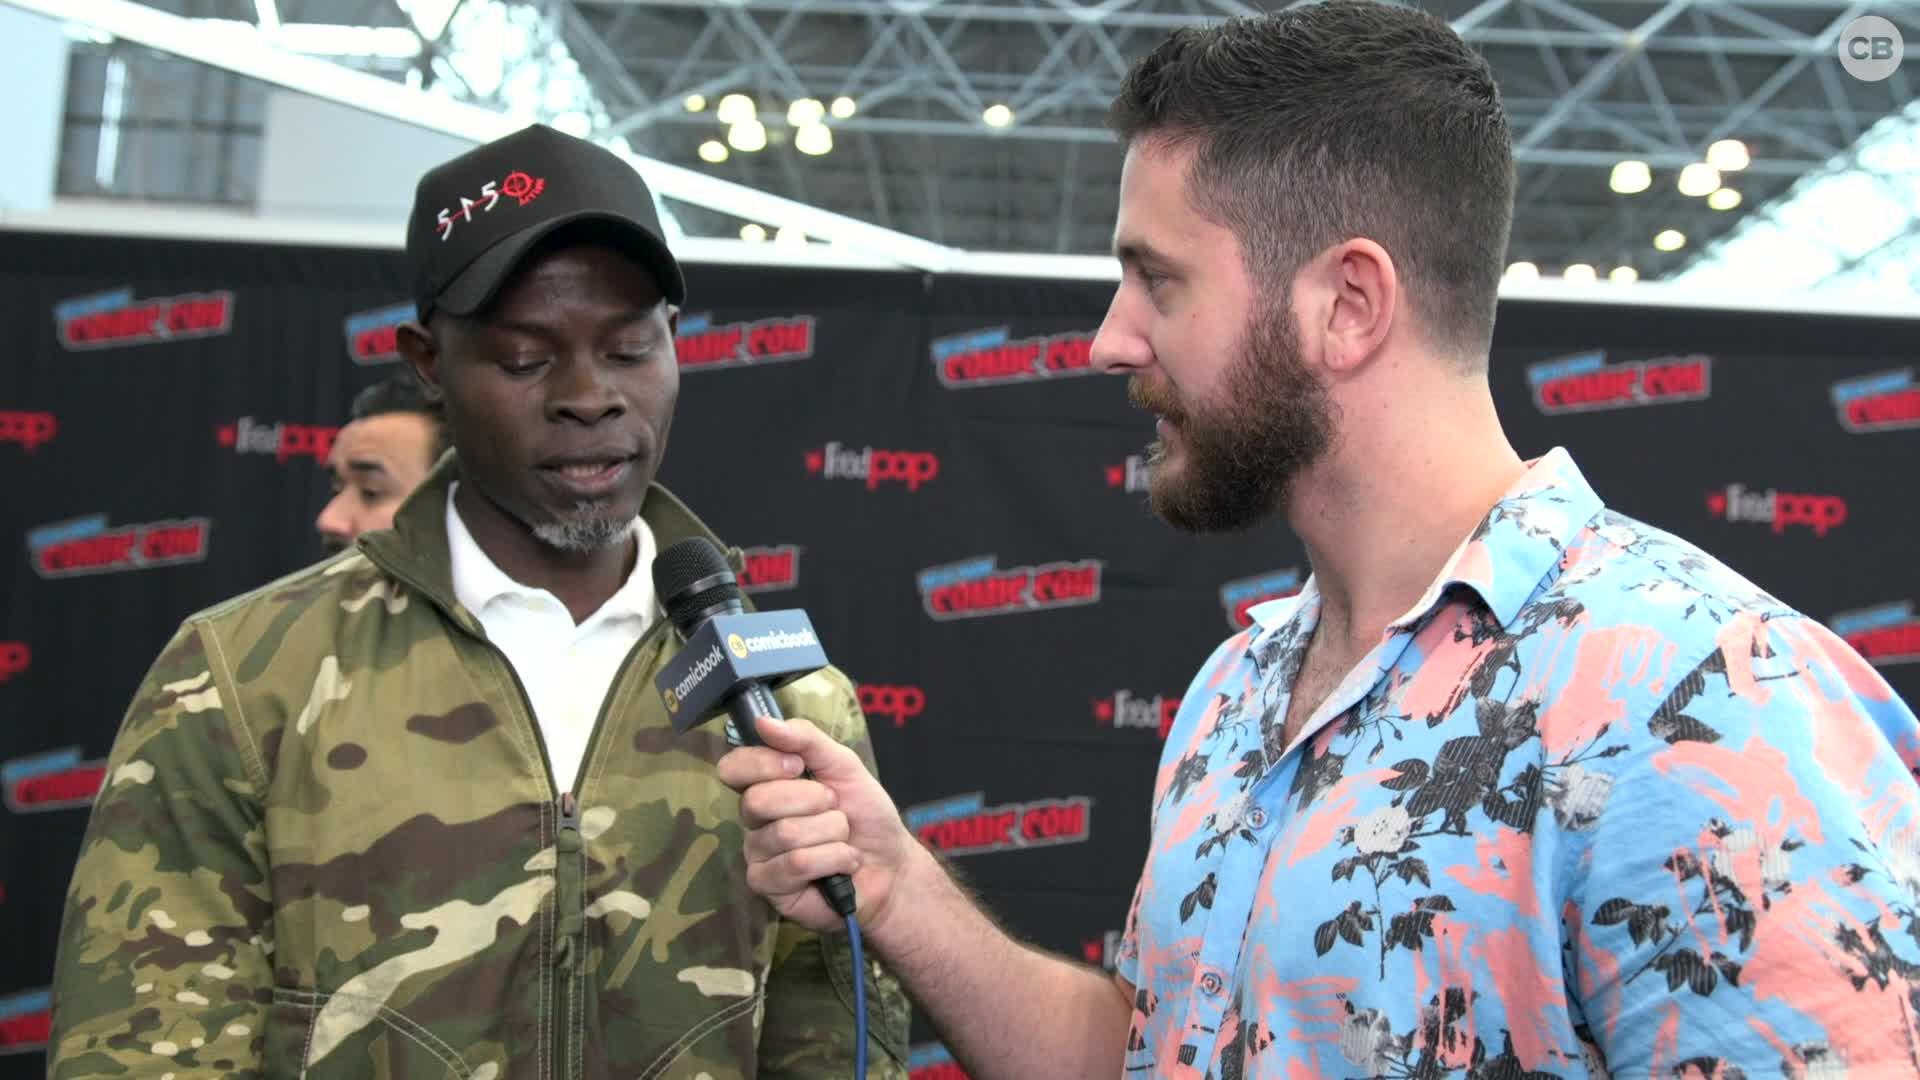 Djimon Hounsou - NYCC 2019 Exclusive Interview screen capture